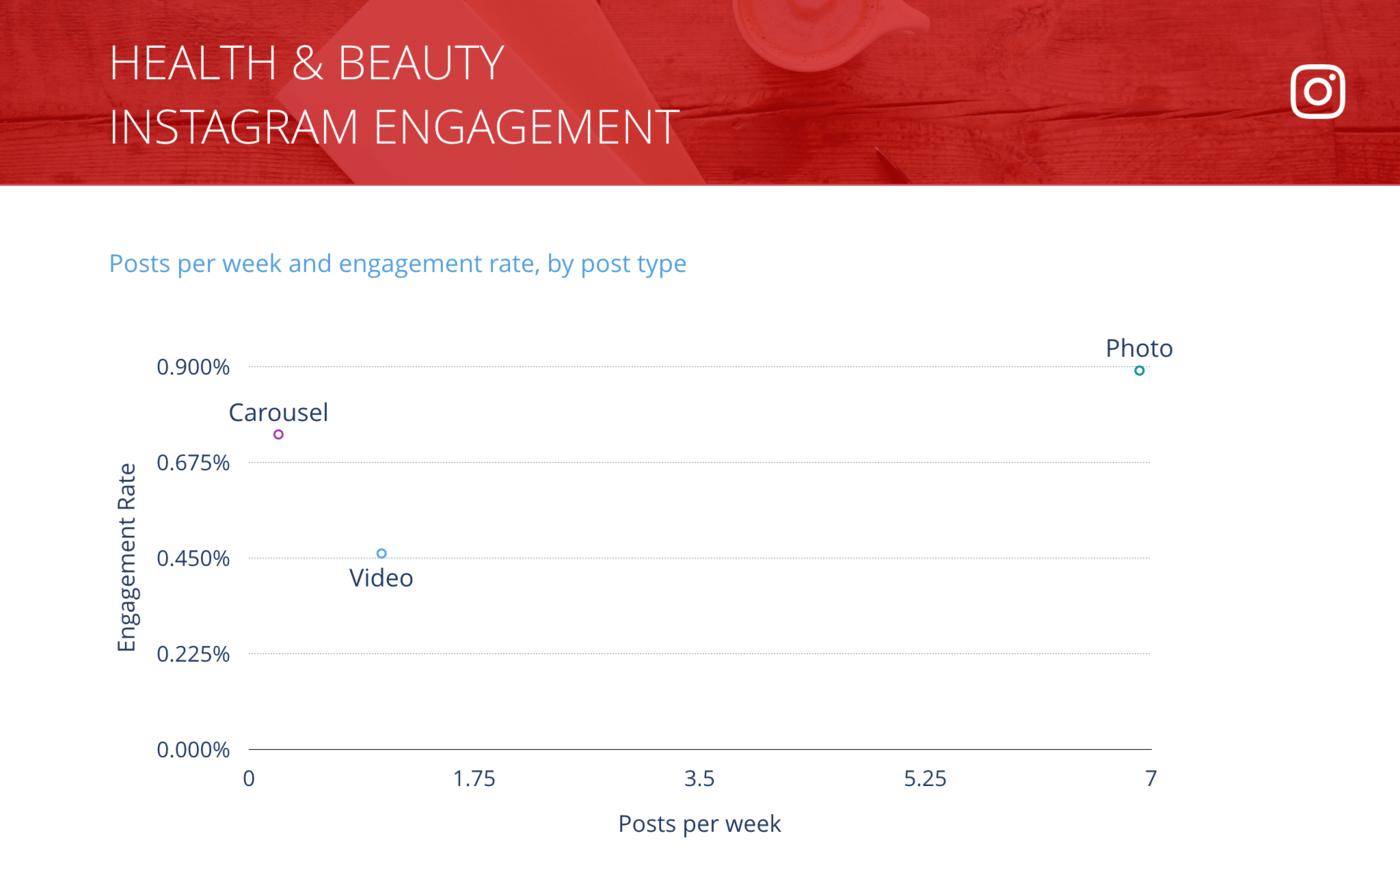 slide for Instagram Posts per Week vs. Engagement Rate per Post, Health & Beauty